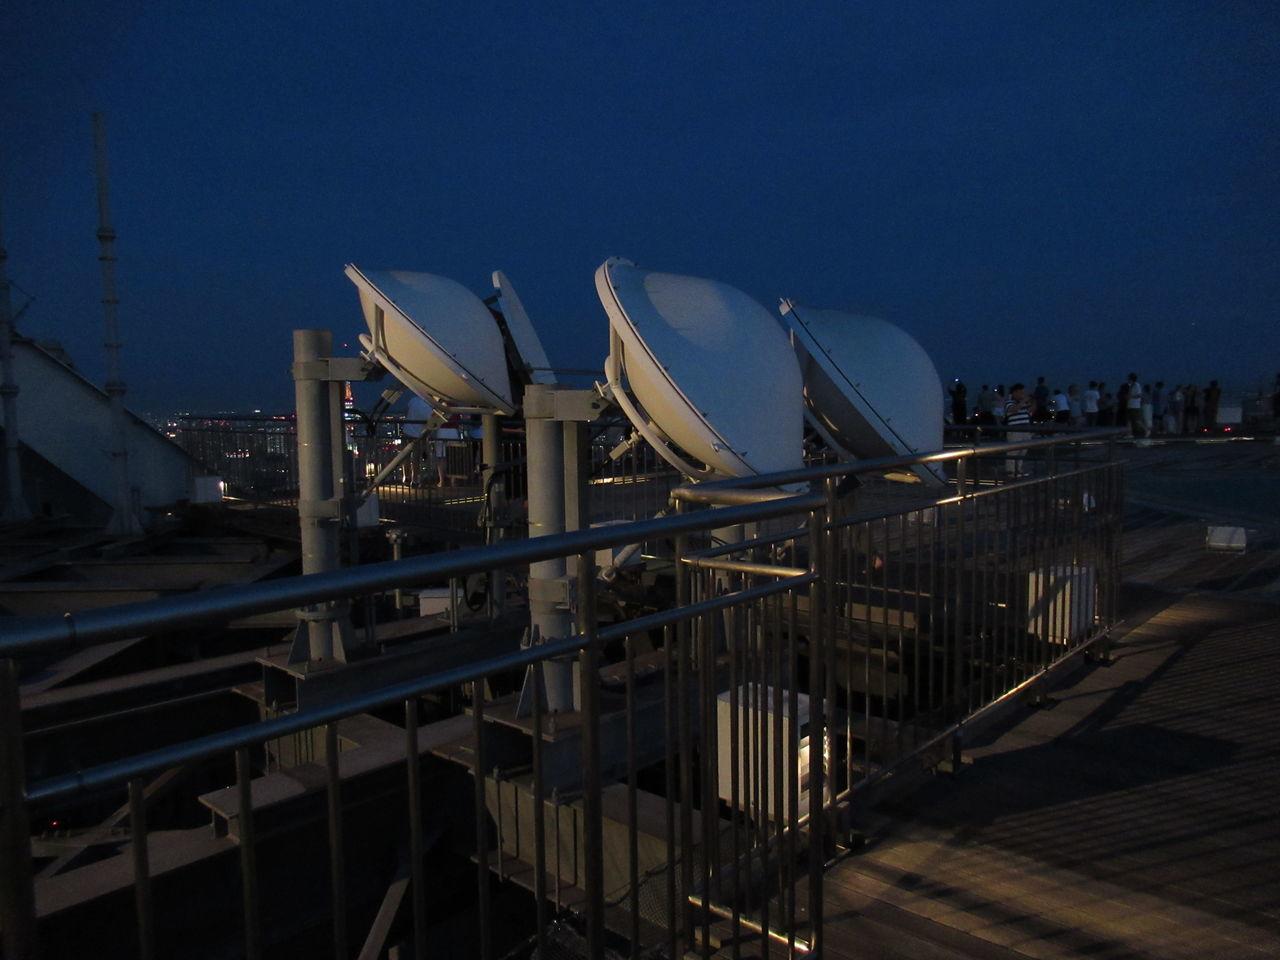 MODERN BUILDINGS AGAINST SKY AT NIGHT